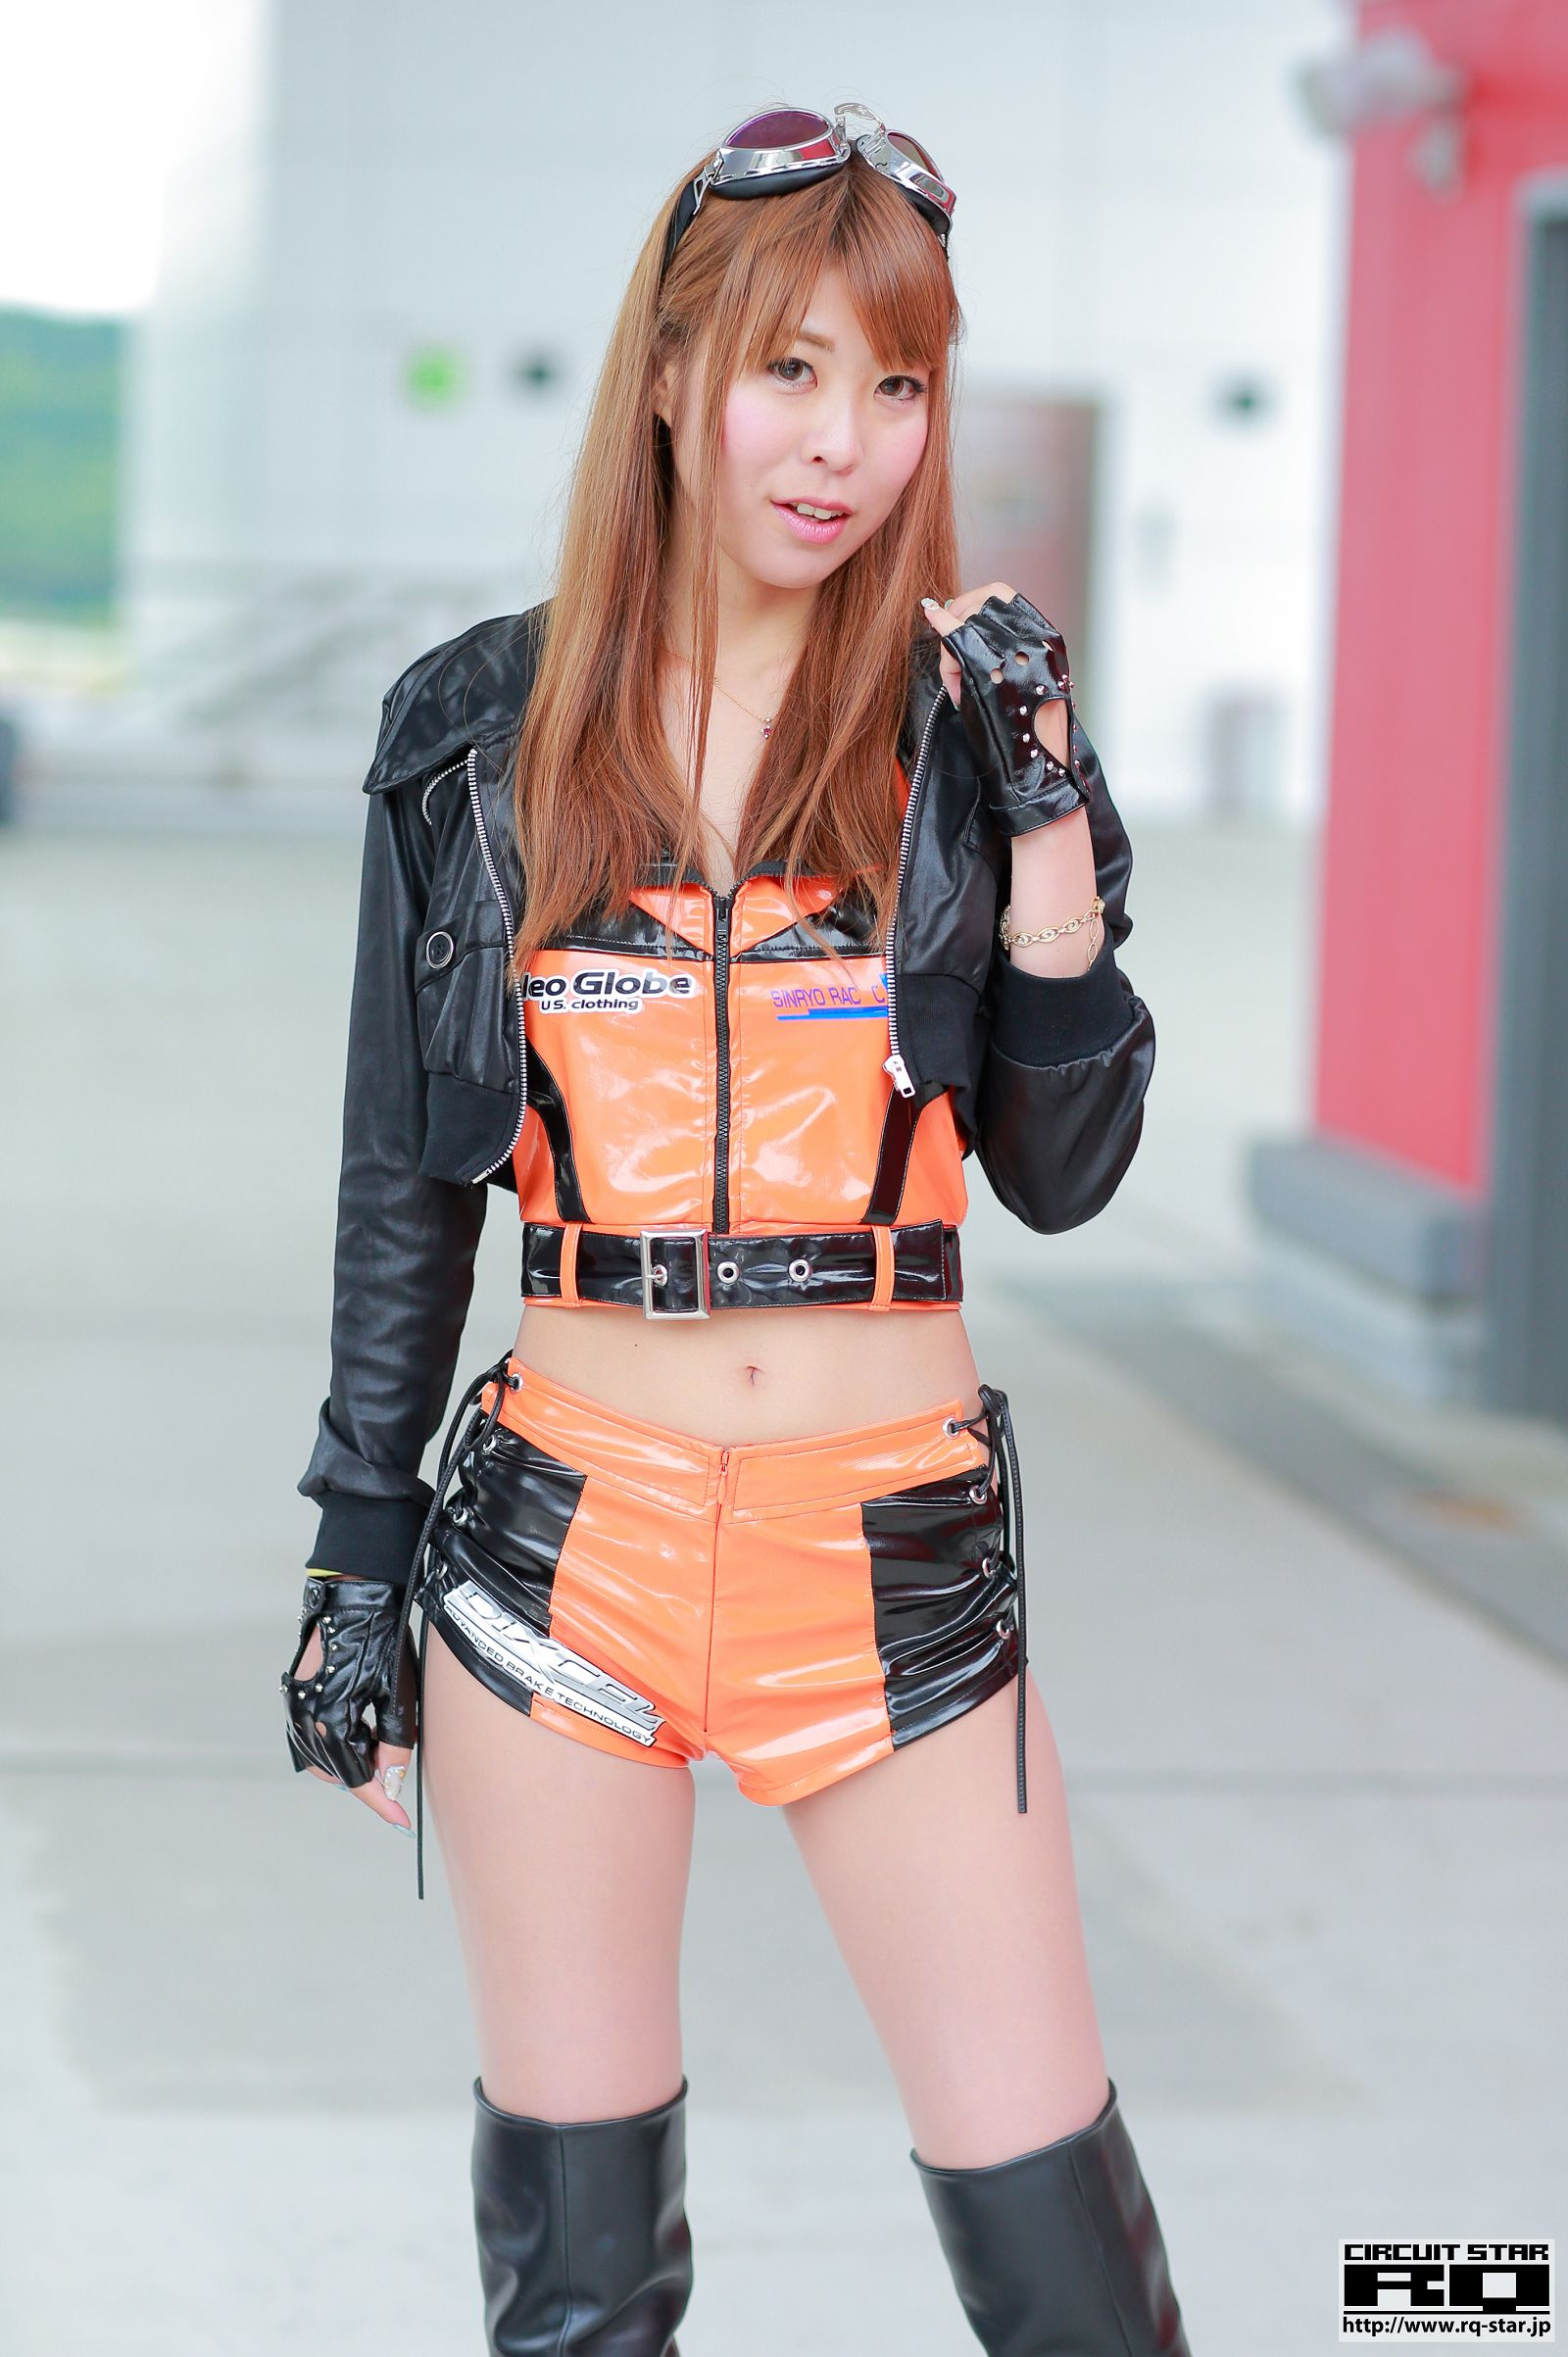 [RQ STAR美女] 2018.03.31 Chie Takeda 武田智恵 Race Queen[24P] RQ STAR 第4张